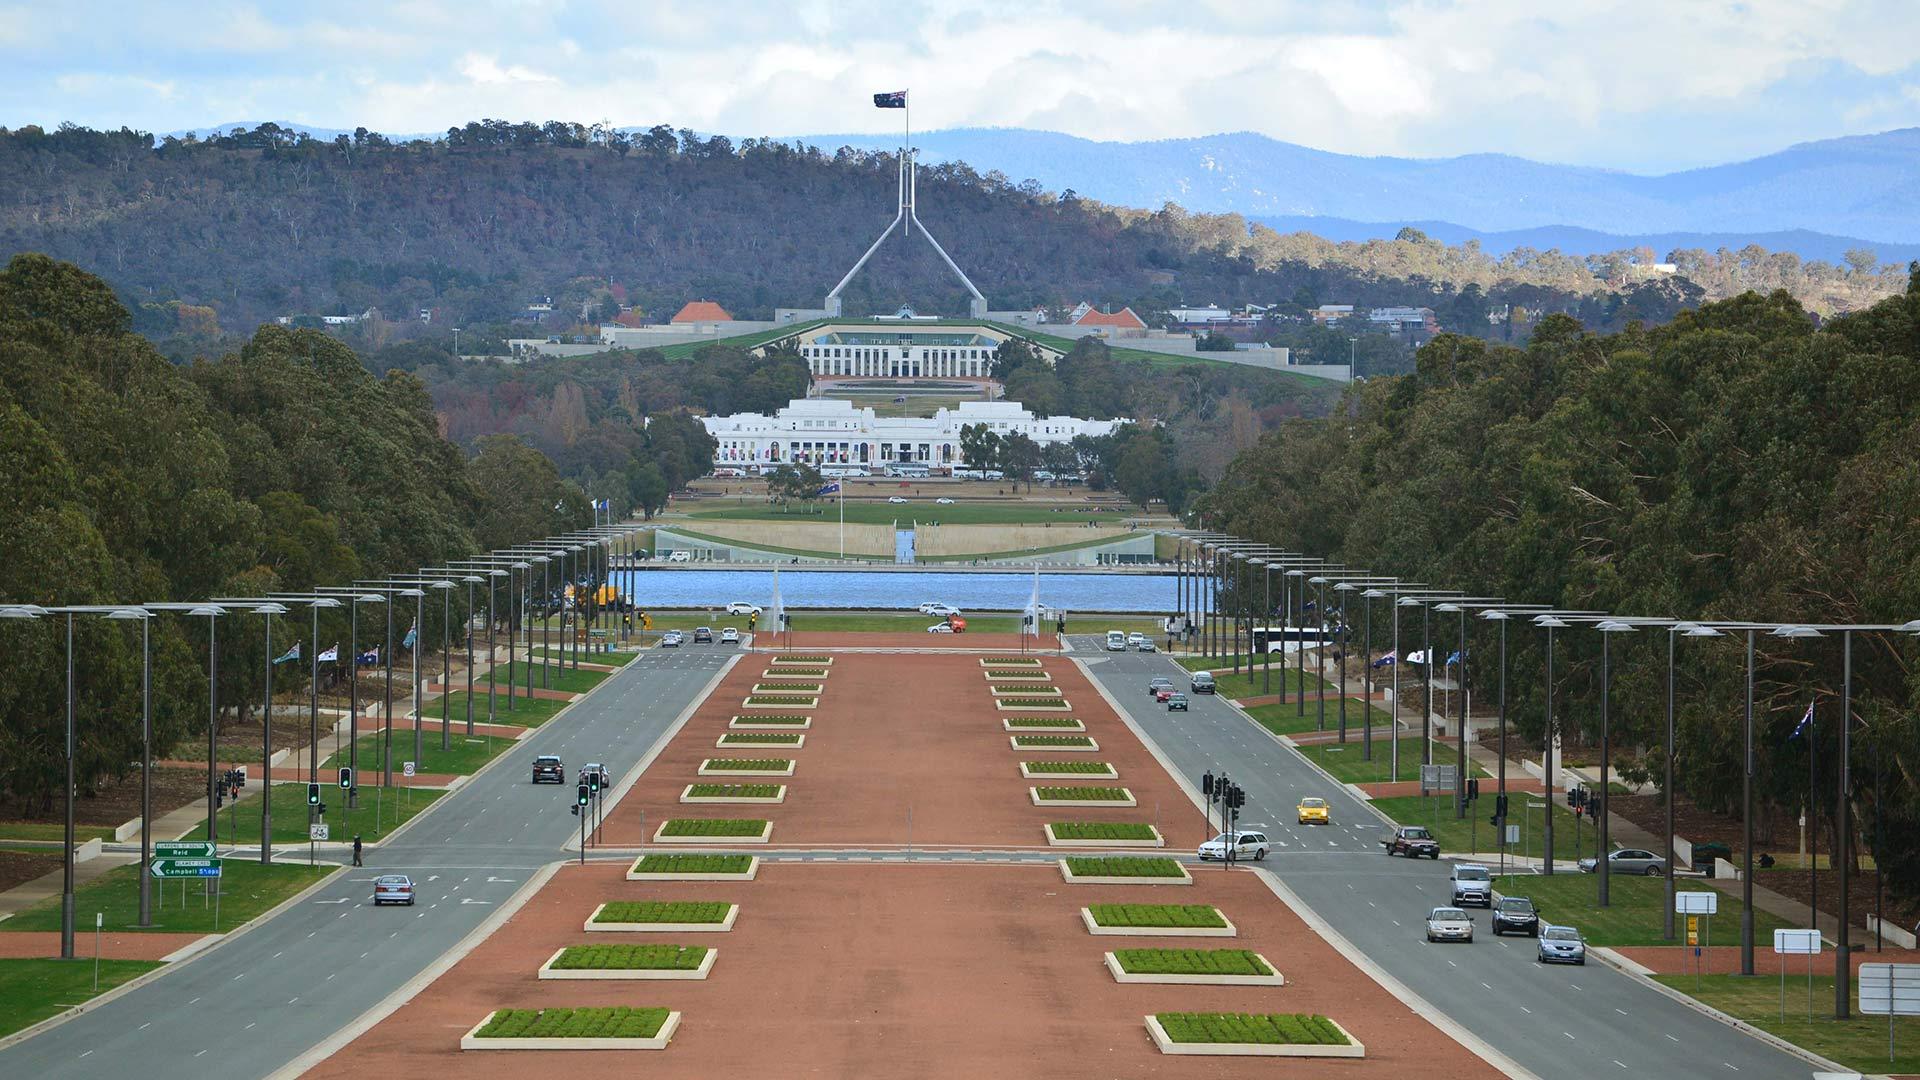 Canberra Tourism